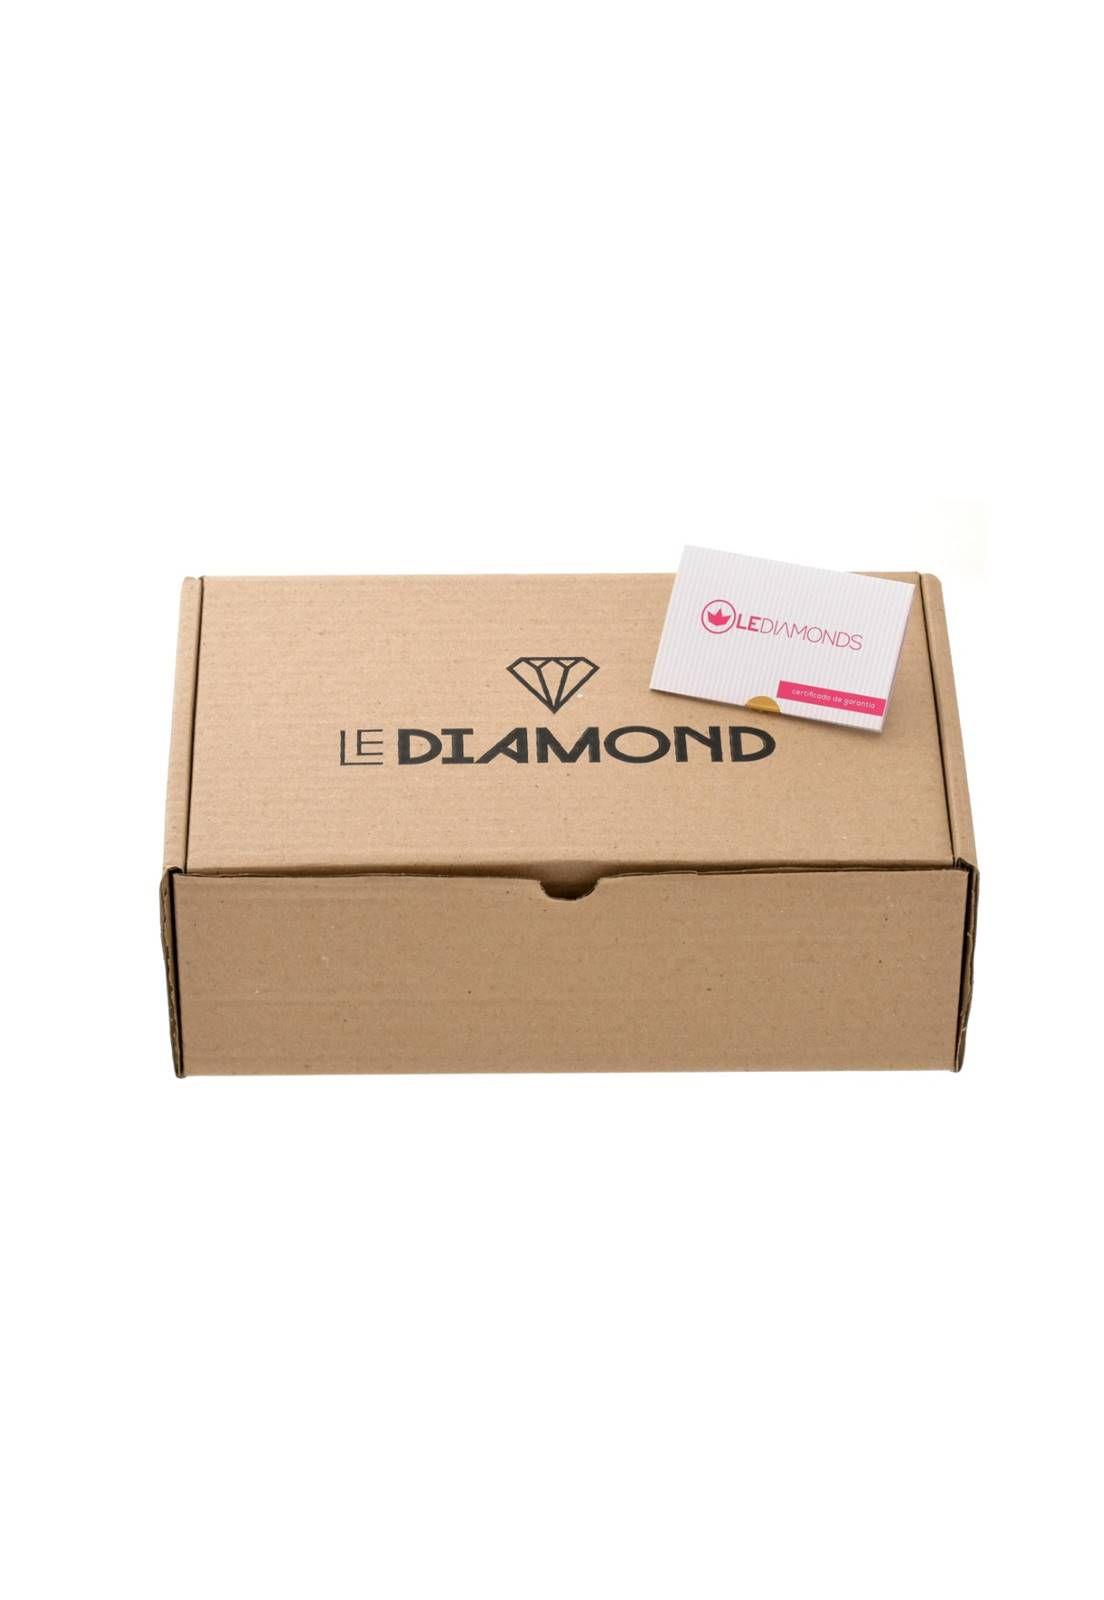 Brinco Le Diamond Carminha Crochê Lilás